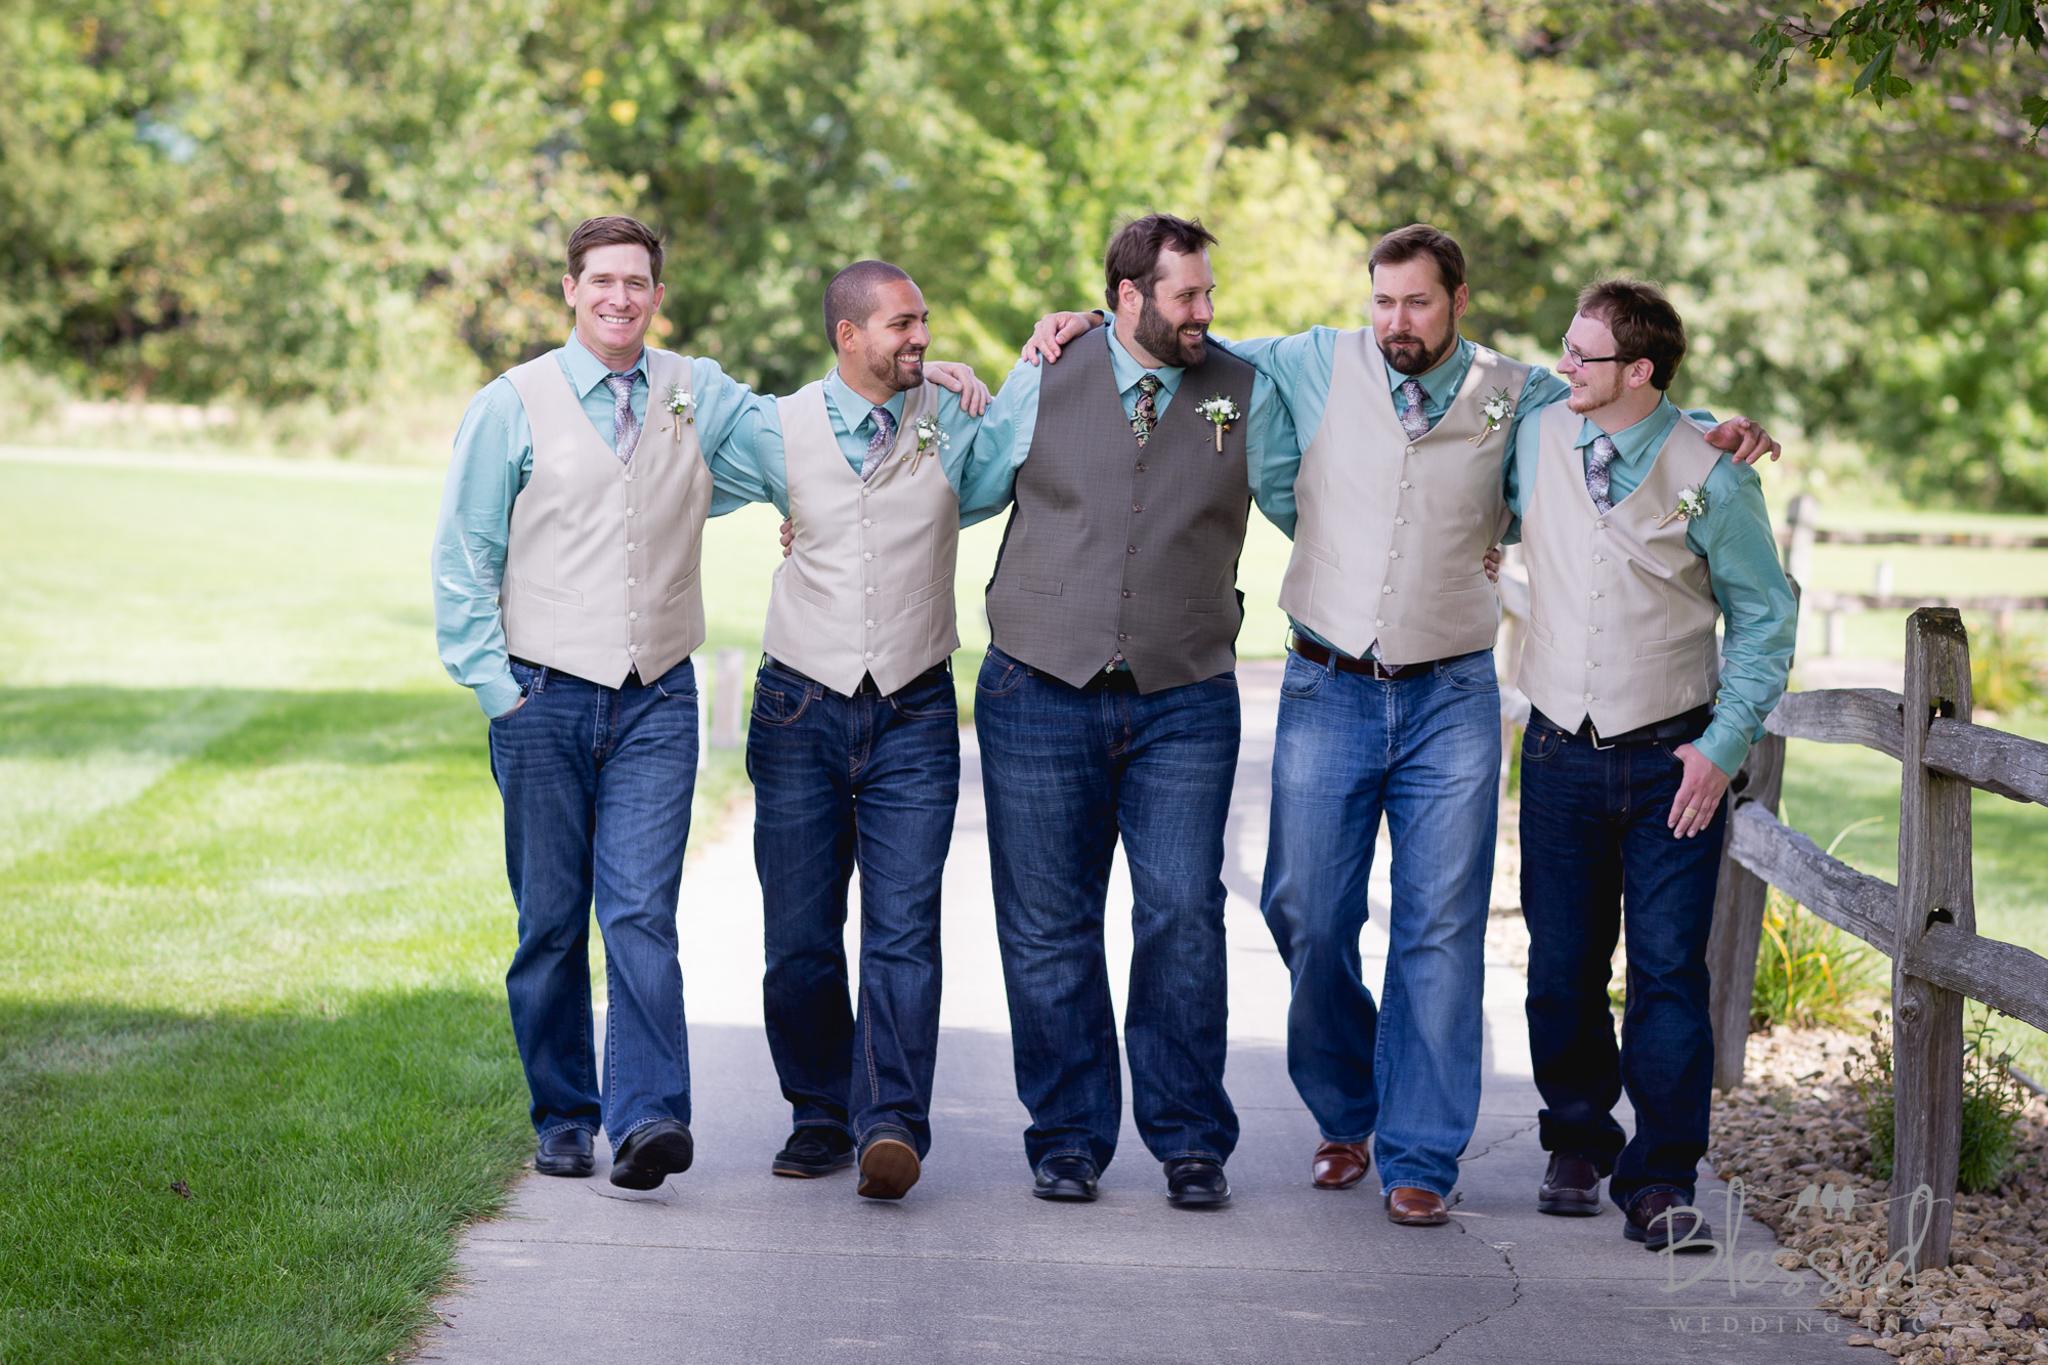 Destination Wedding Photography Minnesota By Blessed Wedding Photographers-17.jpg